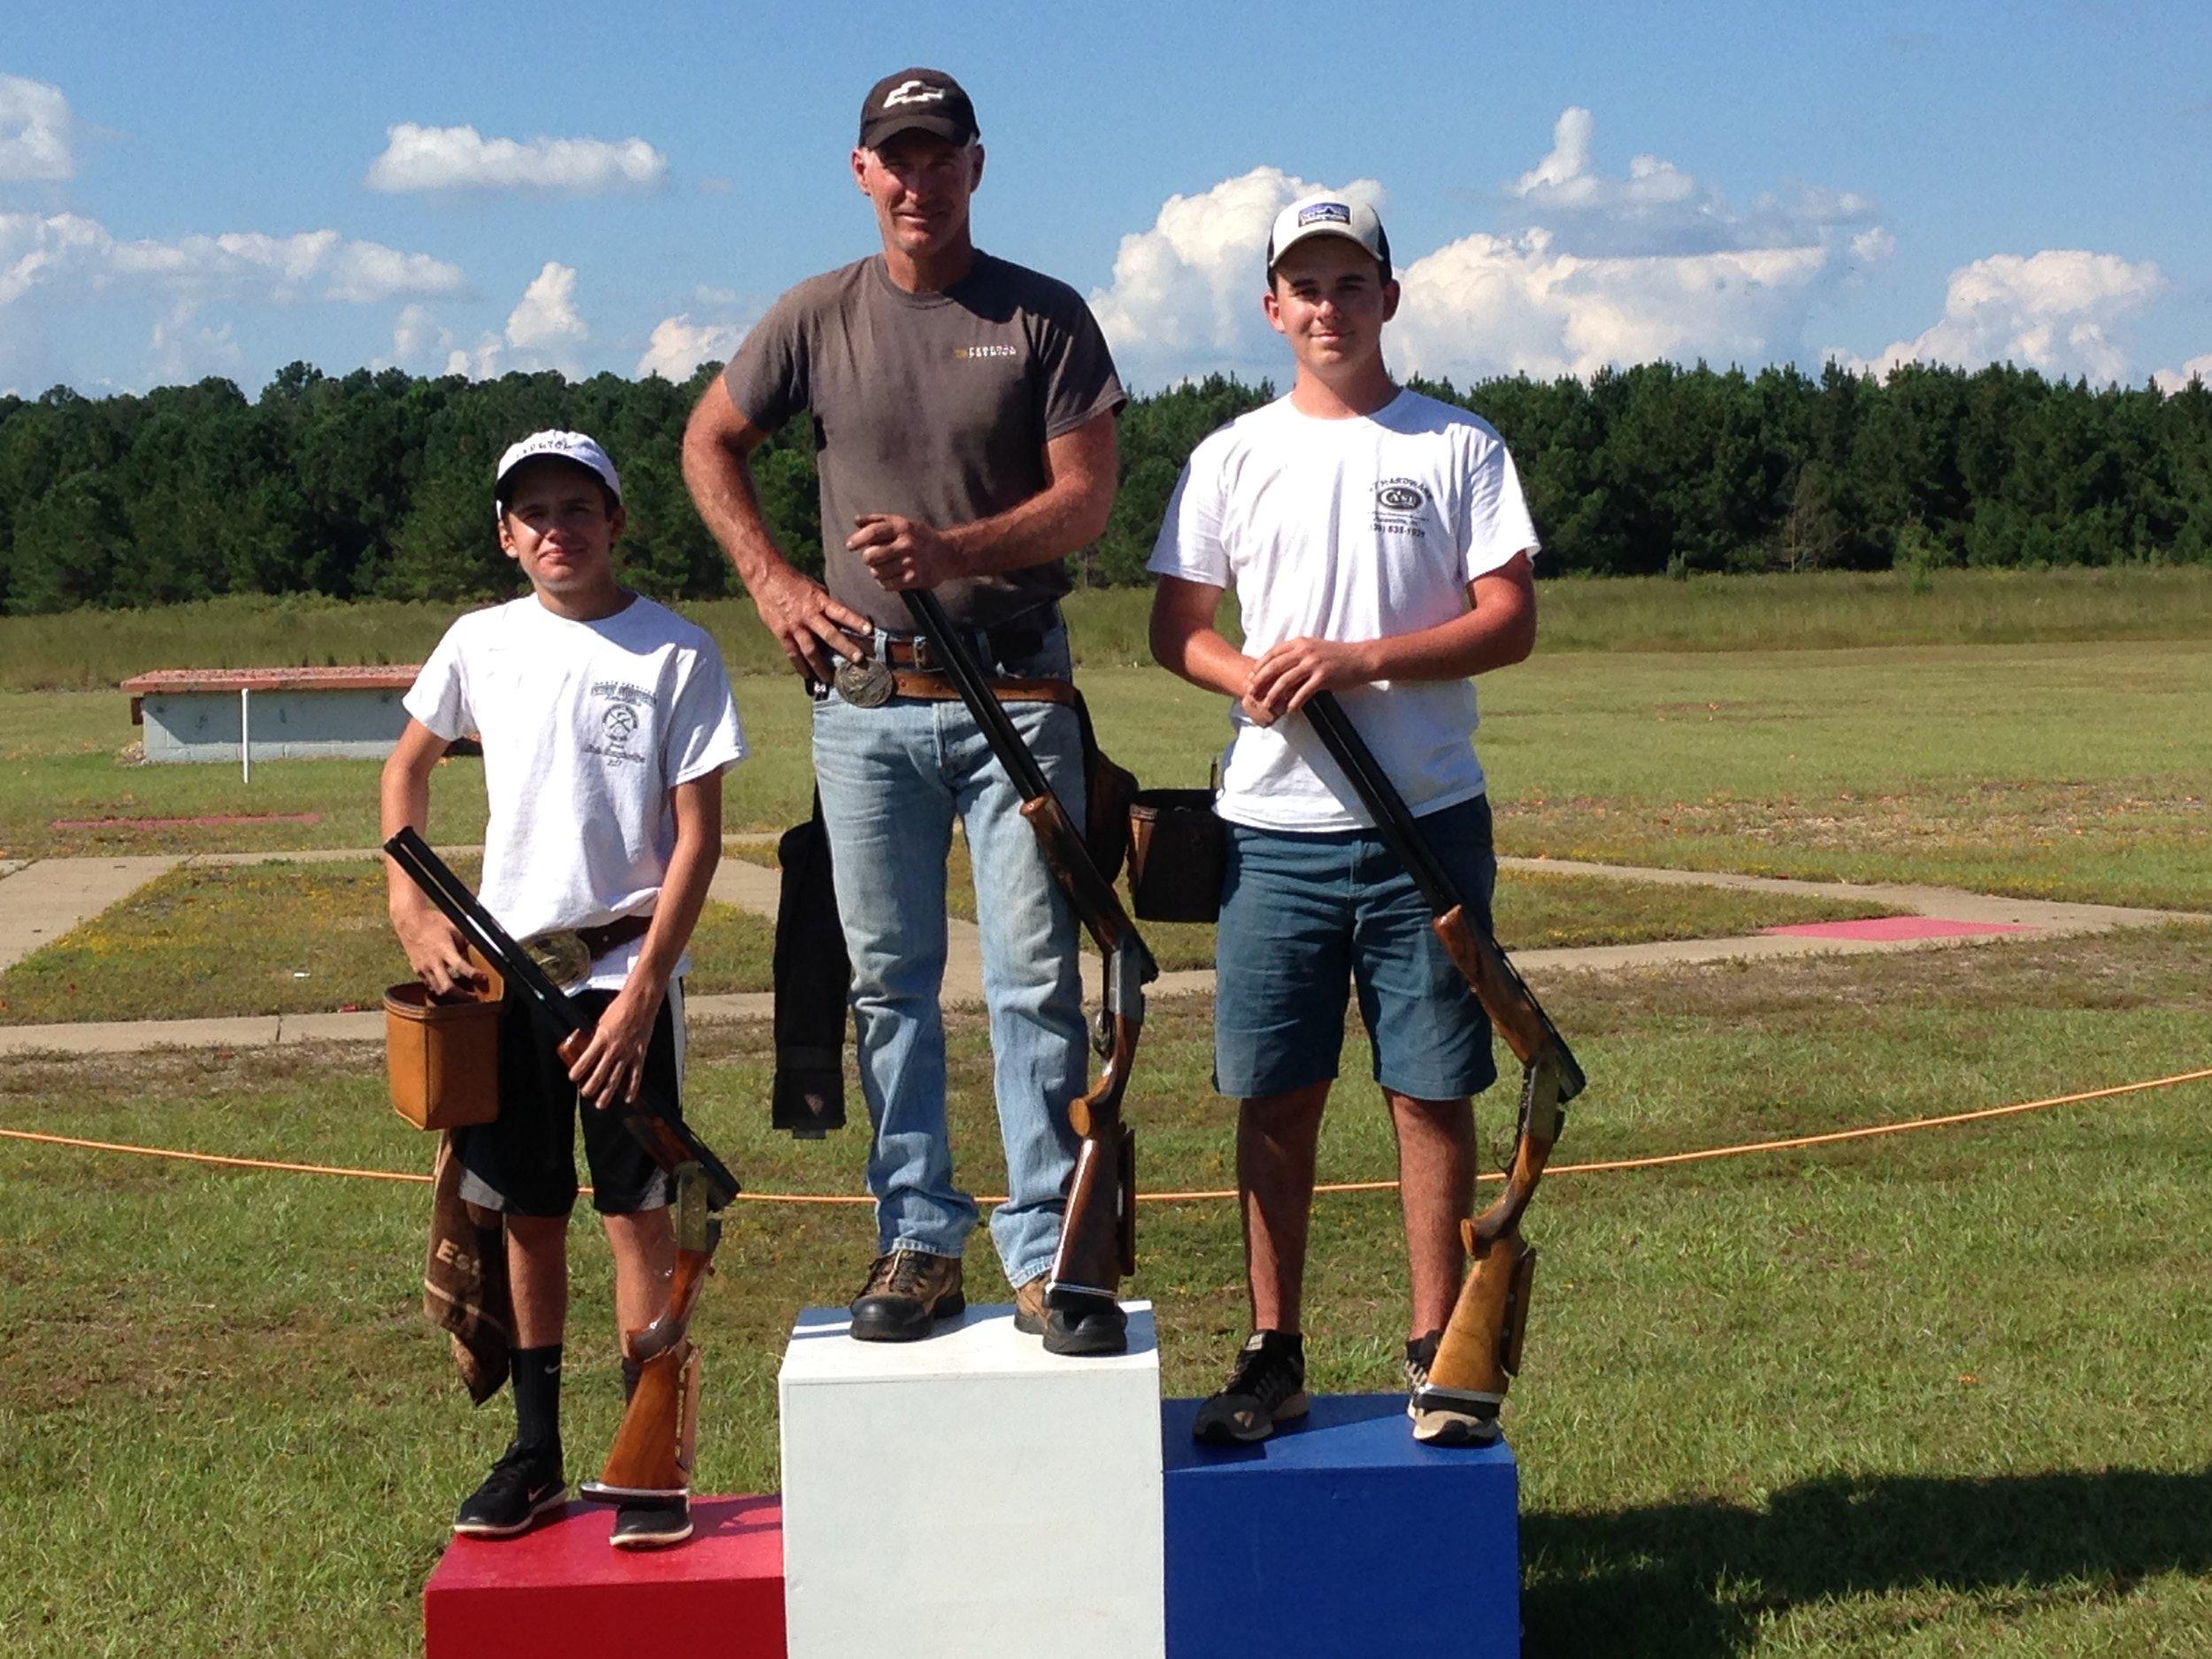 28 ga winners: Champion - Stuart Brown (100), Runner-up - Riley Dellinger (100), and 3rd - Grayson Williams (100).